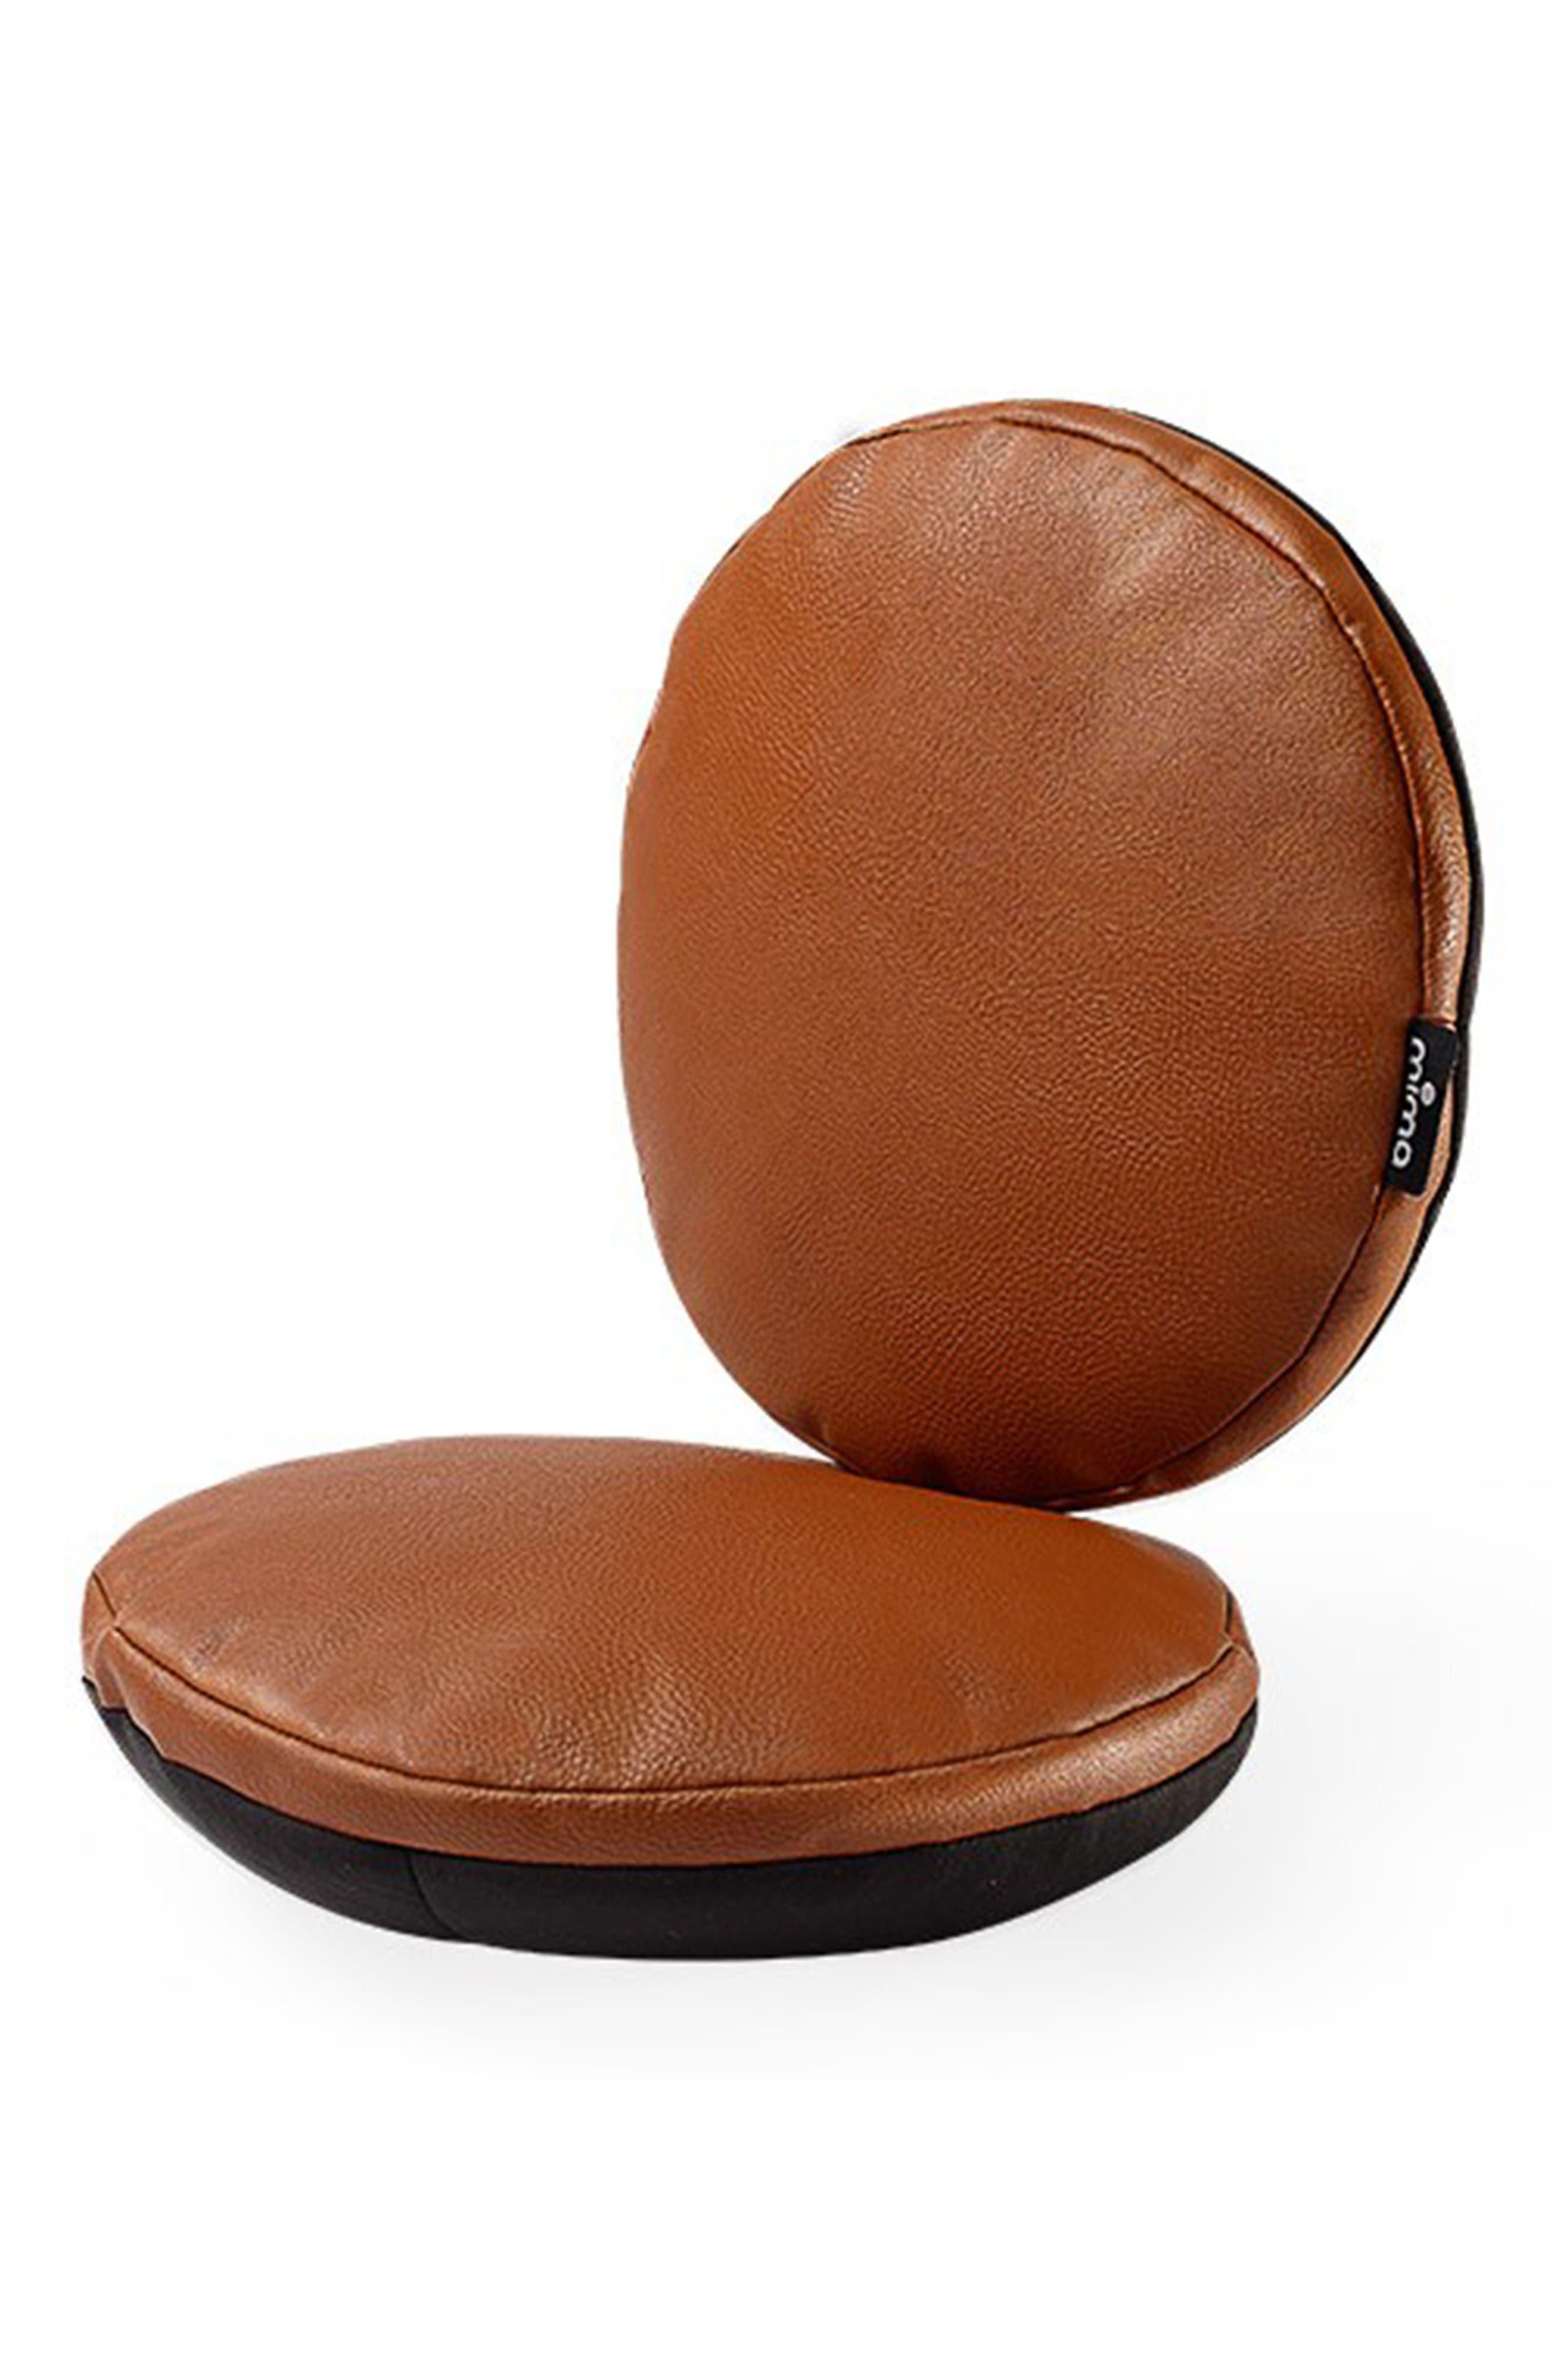 Mima Moon Junior Highchair Seat Cushion